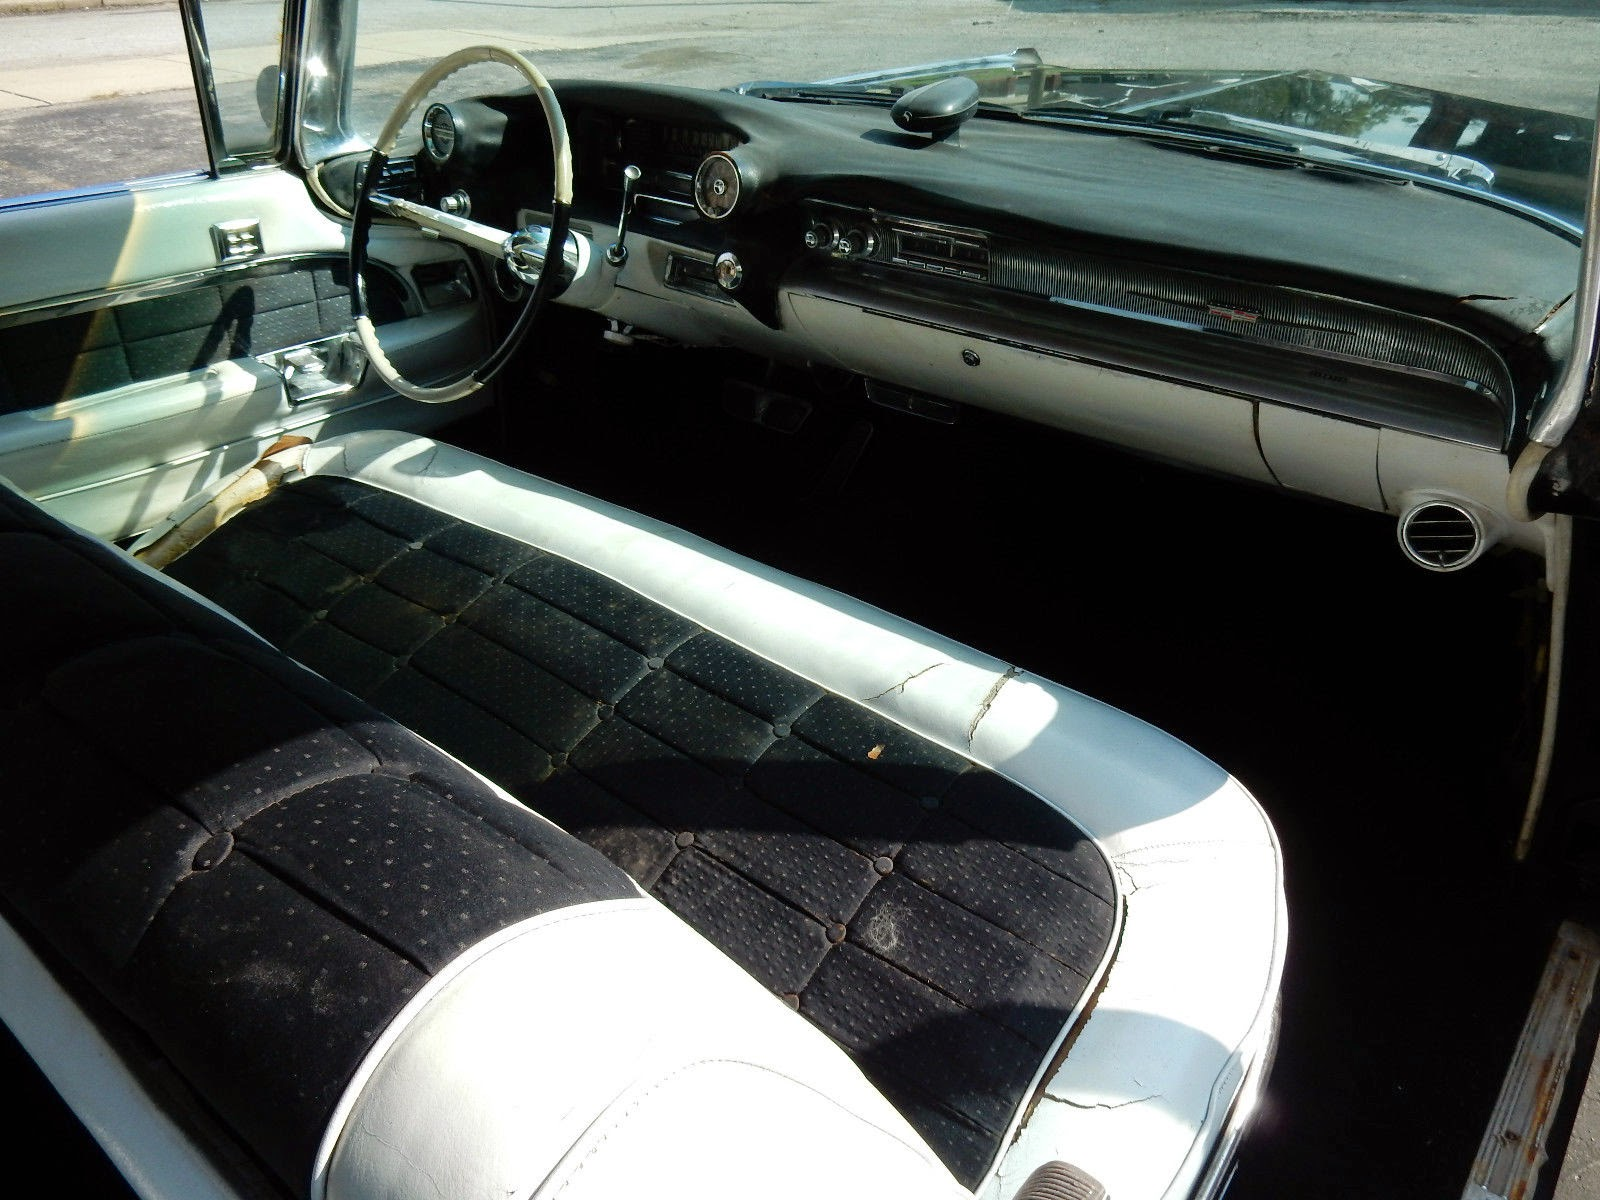 1959 Cadillac Fleetwood Eldorado Running And Driving ...